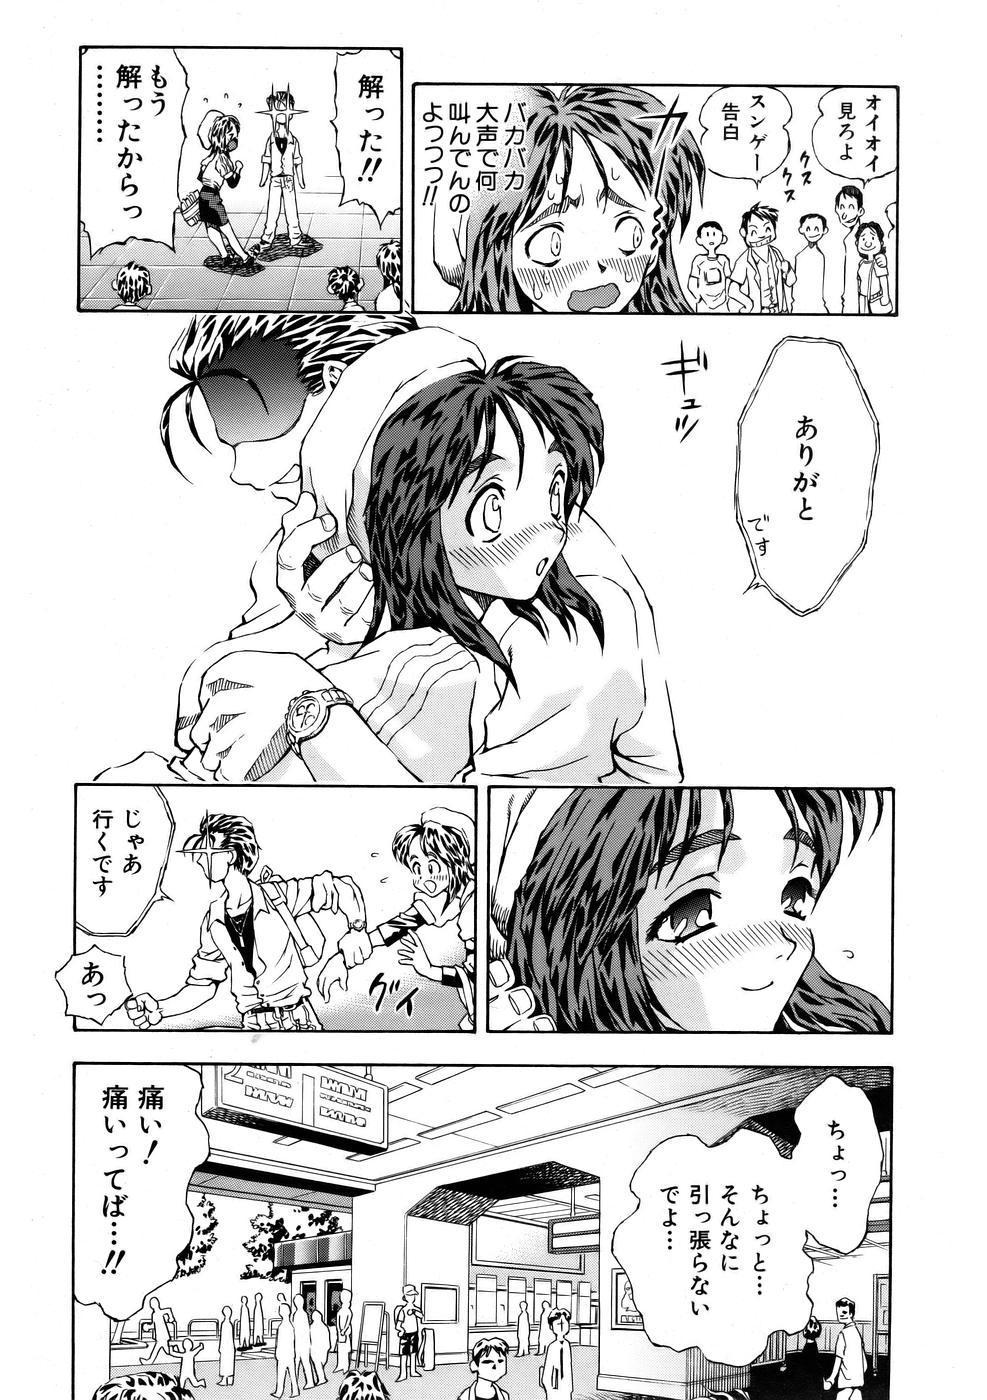 COMIC AUN 2005-10 Vol. 113 350